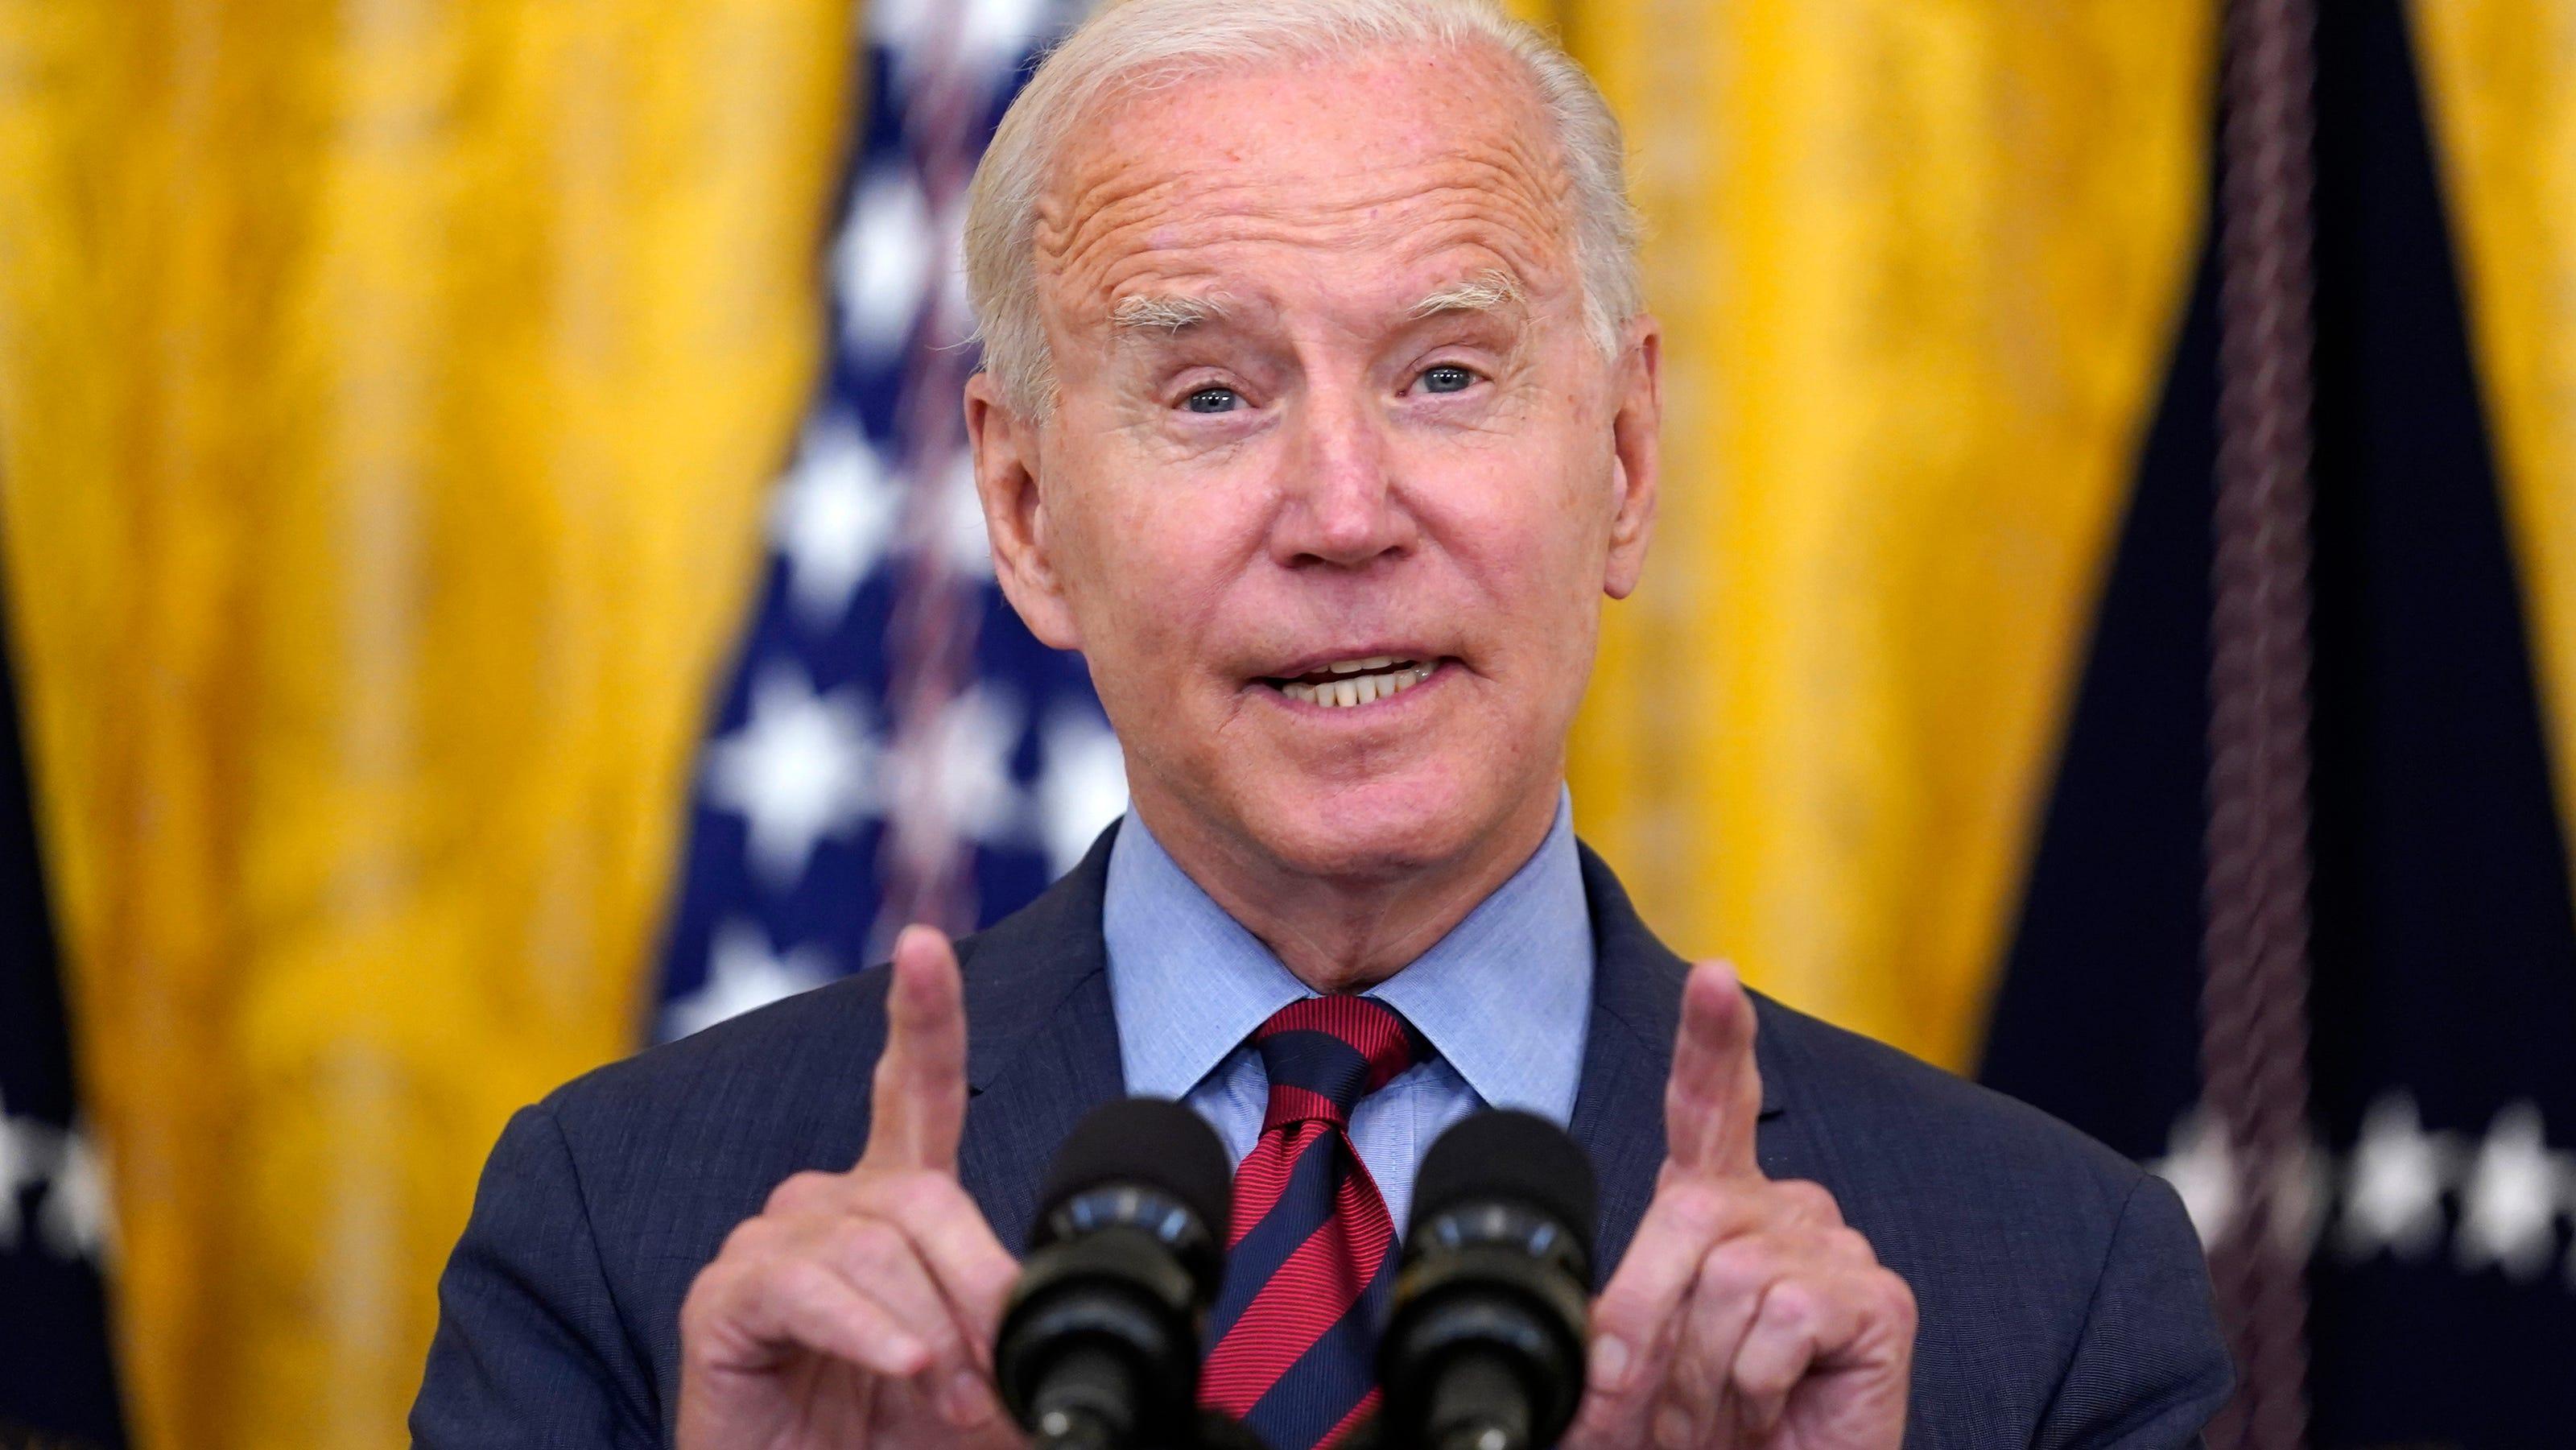 President Biden criticizes Greg Abbott, Ron DeSantis over COVID-19